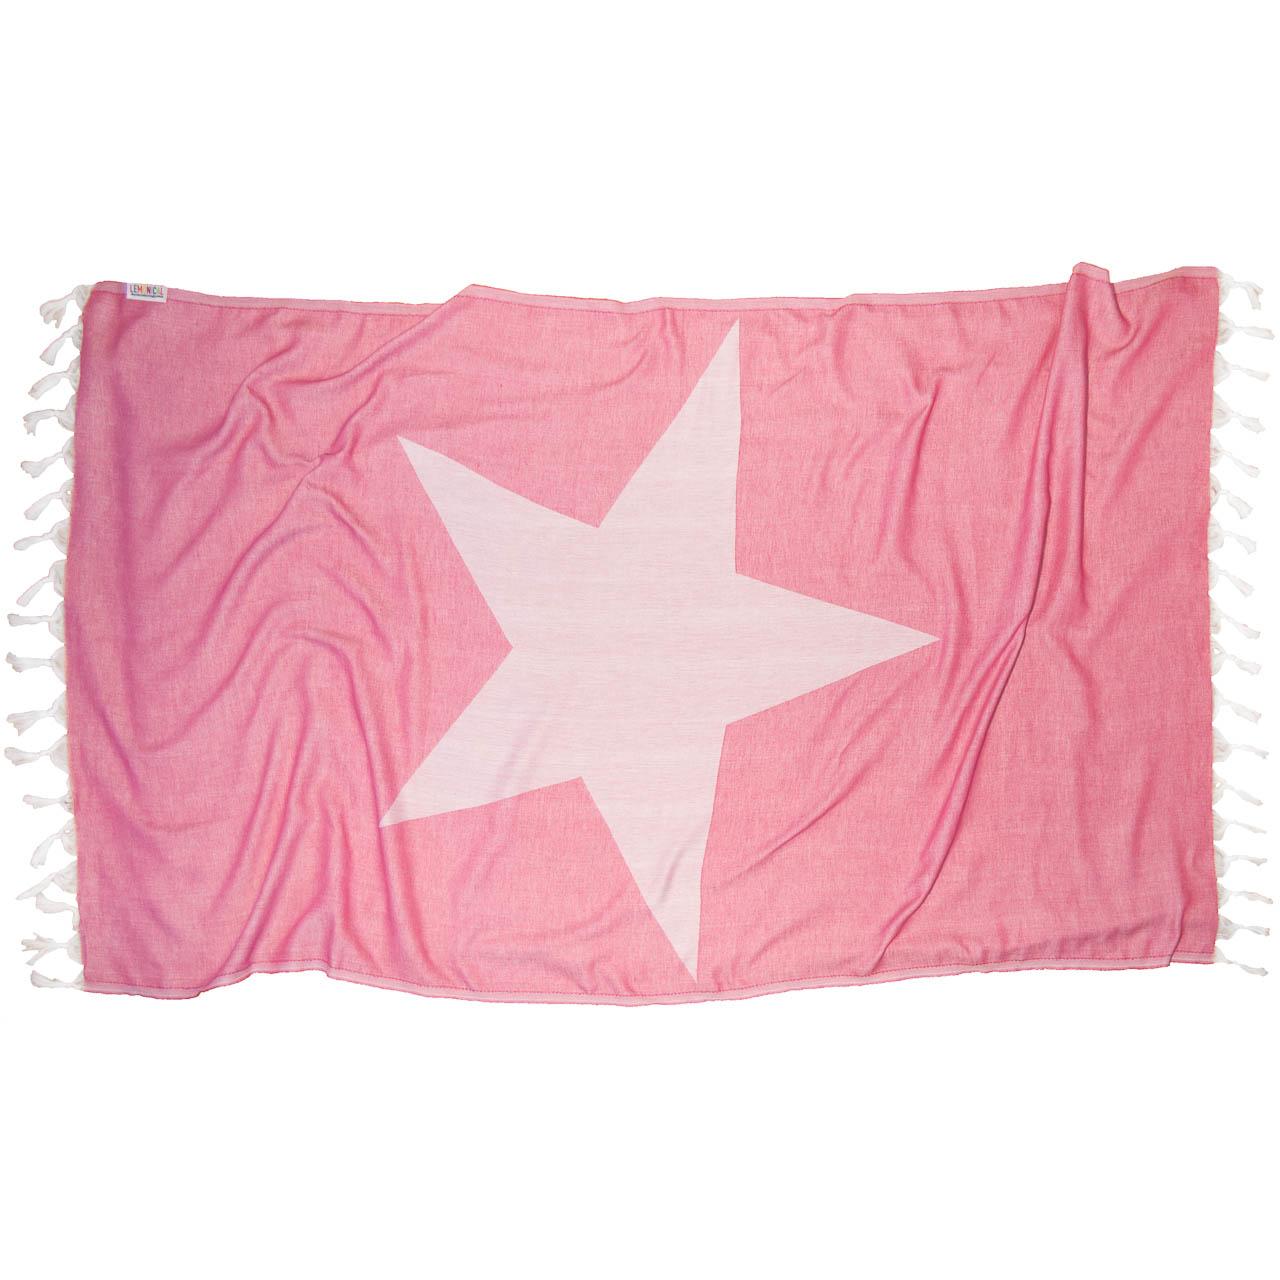 PINK STAR Beach Towel Lemonical